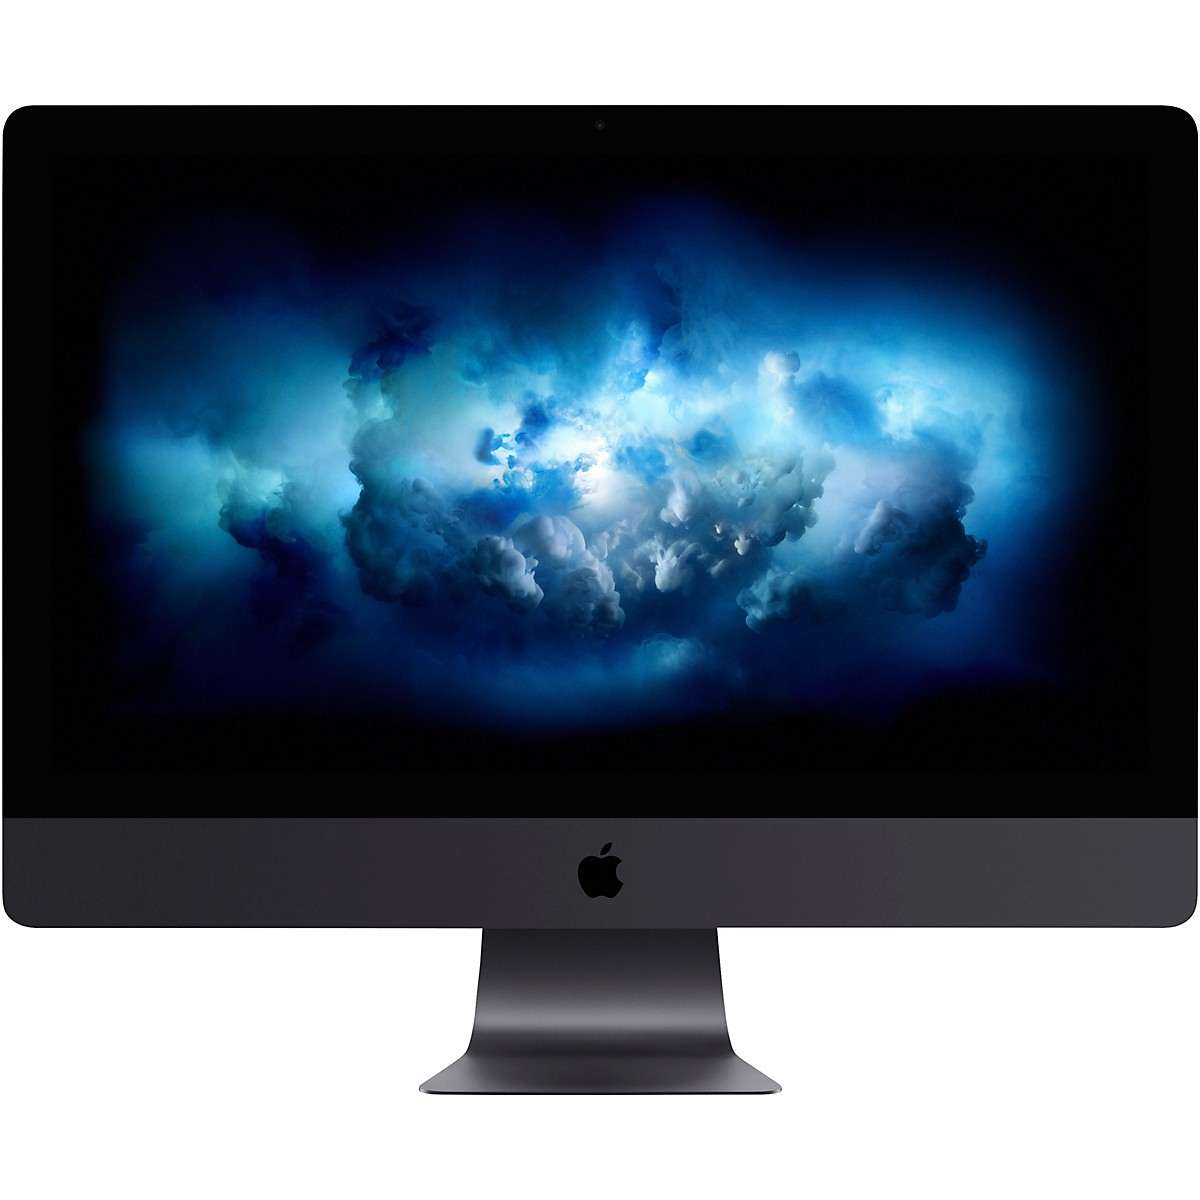 Apple 27-inch iMac Pro with Retina 5K 3.0GHz 10-core Intel Xeon W (MHLV3LL/A)